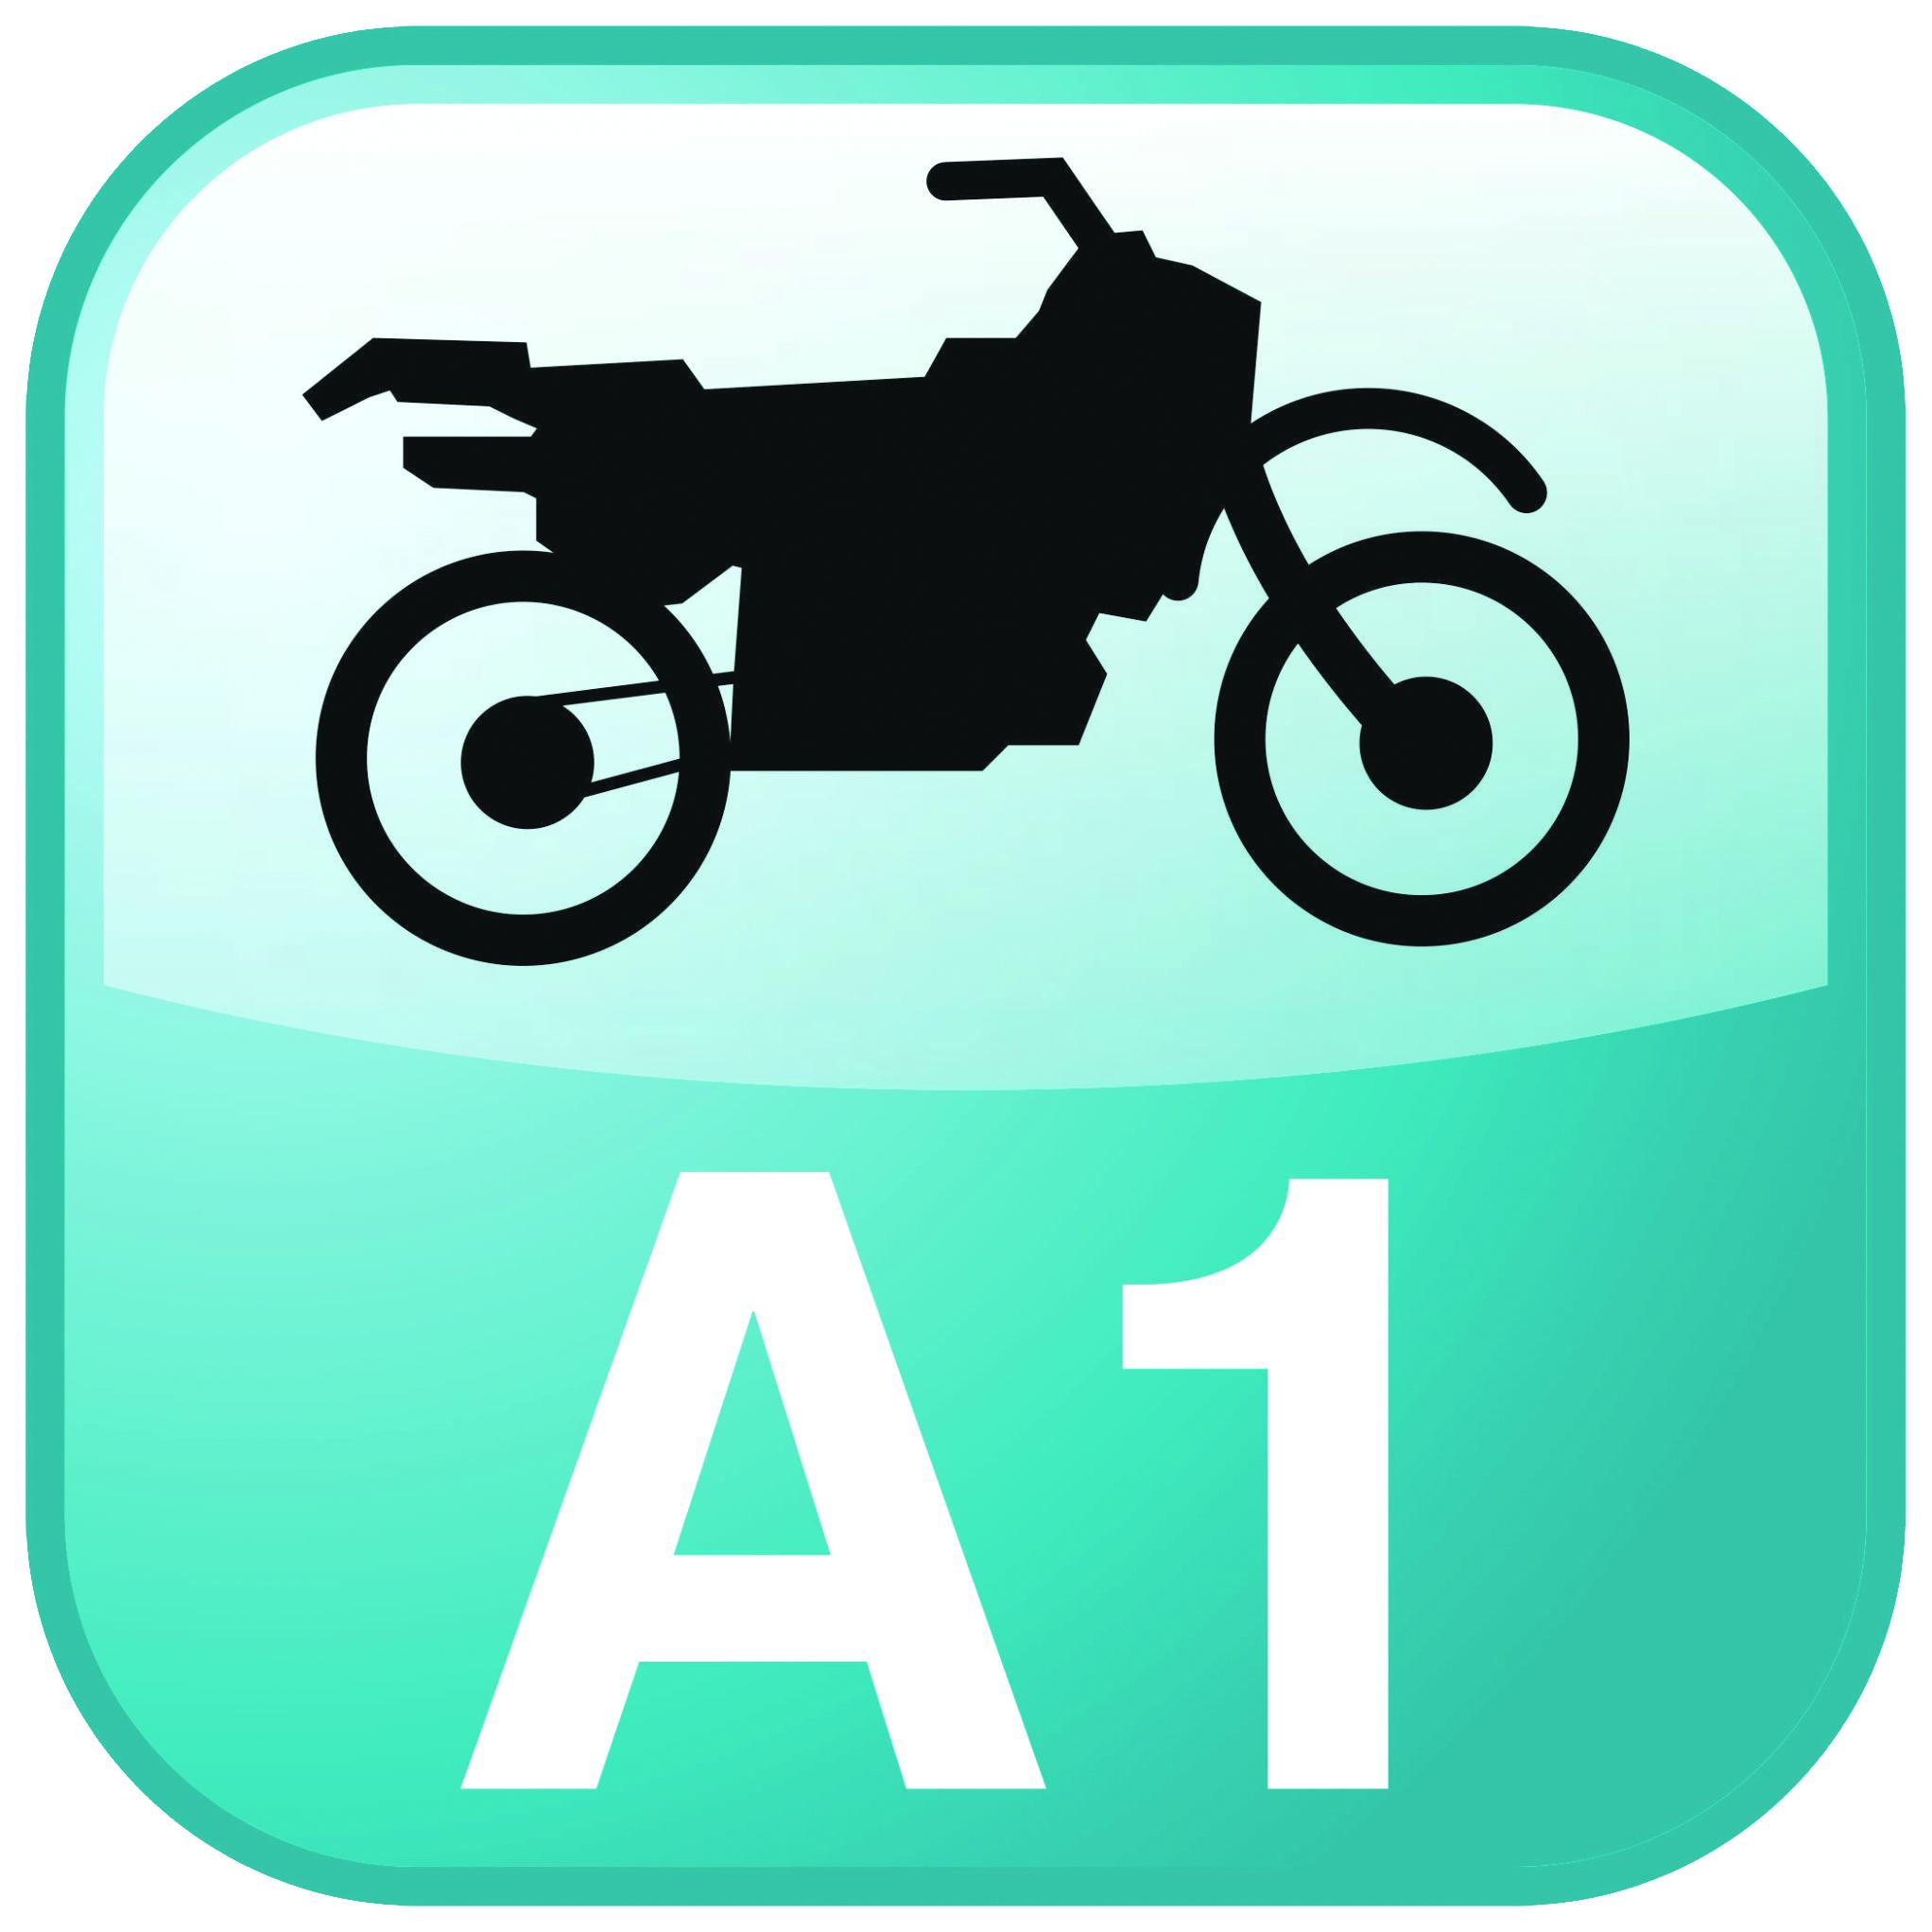 Fahrerlaubnisklasse A1